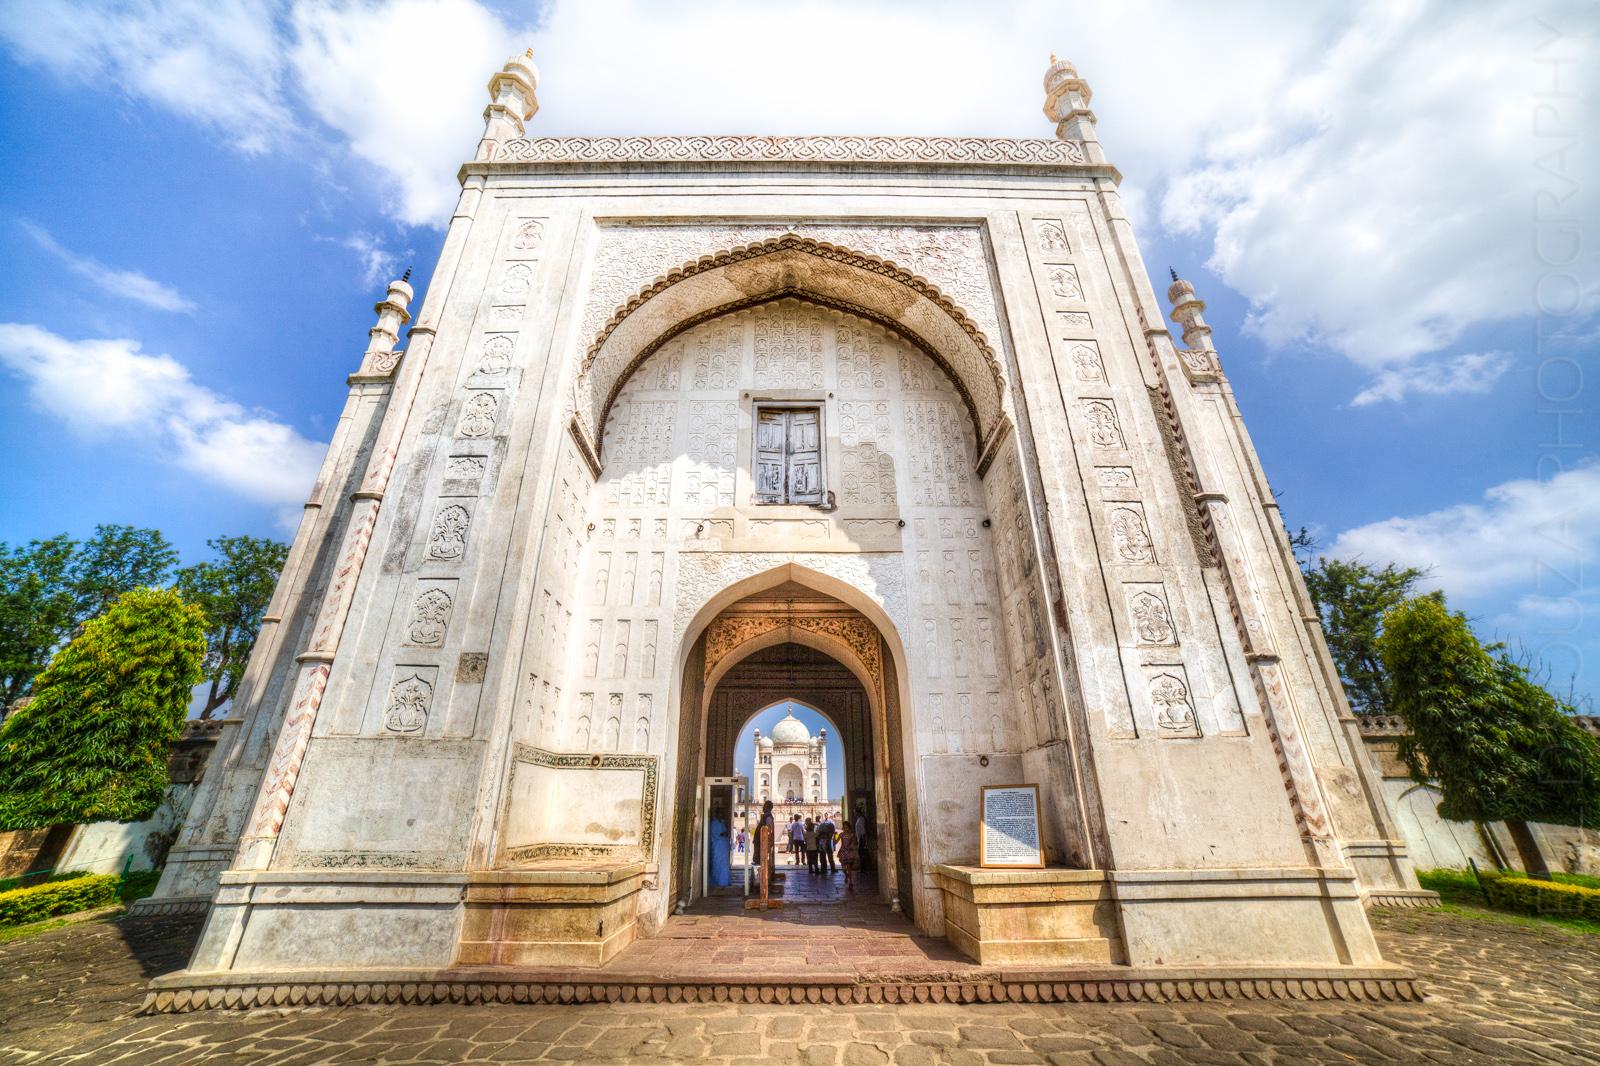 Bibi Ka Maqbara - The Gateway